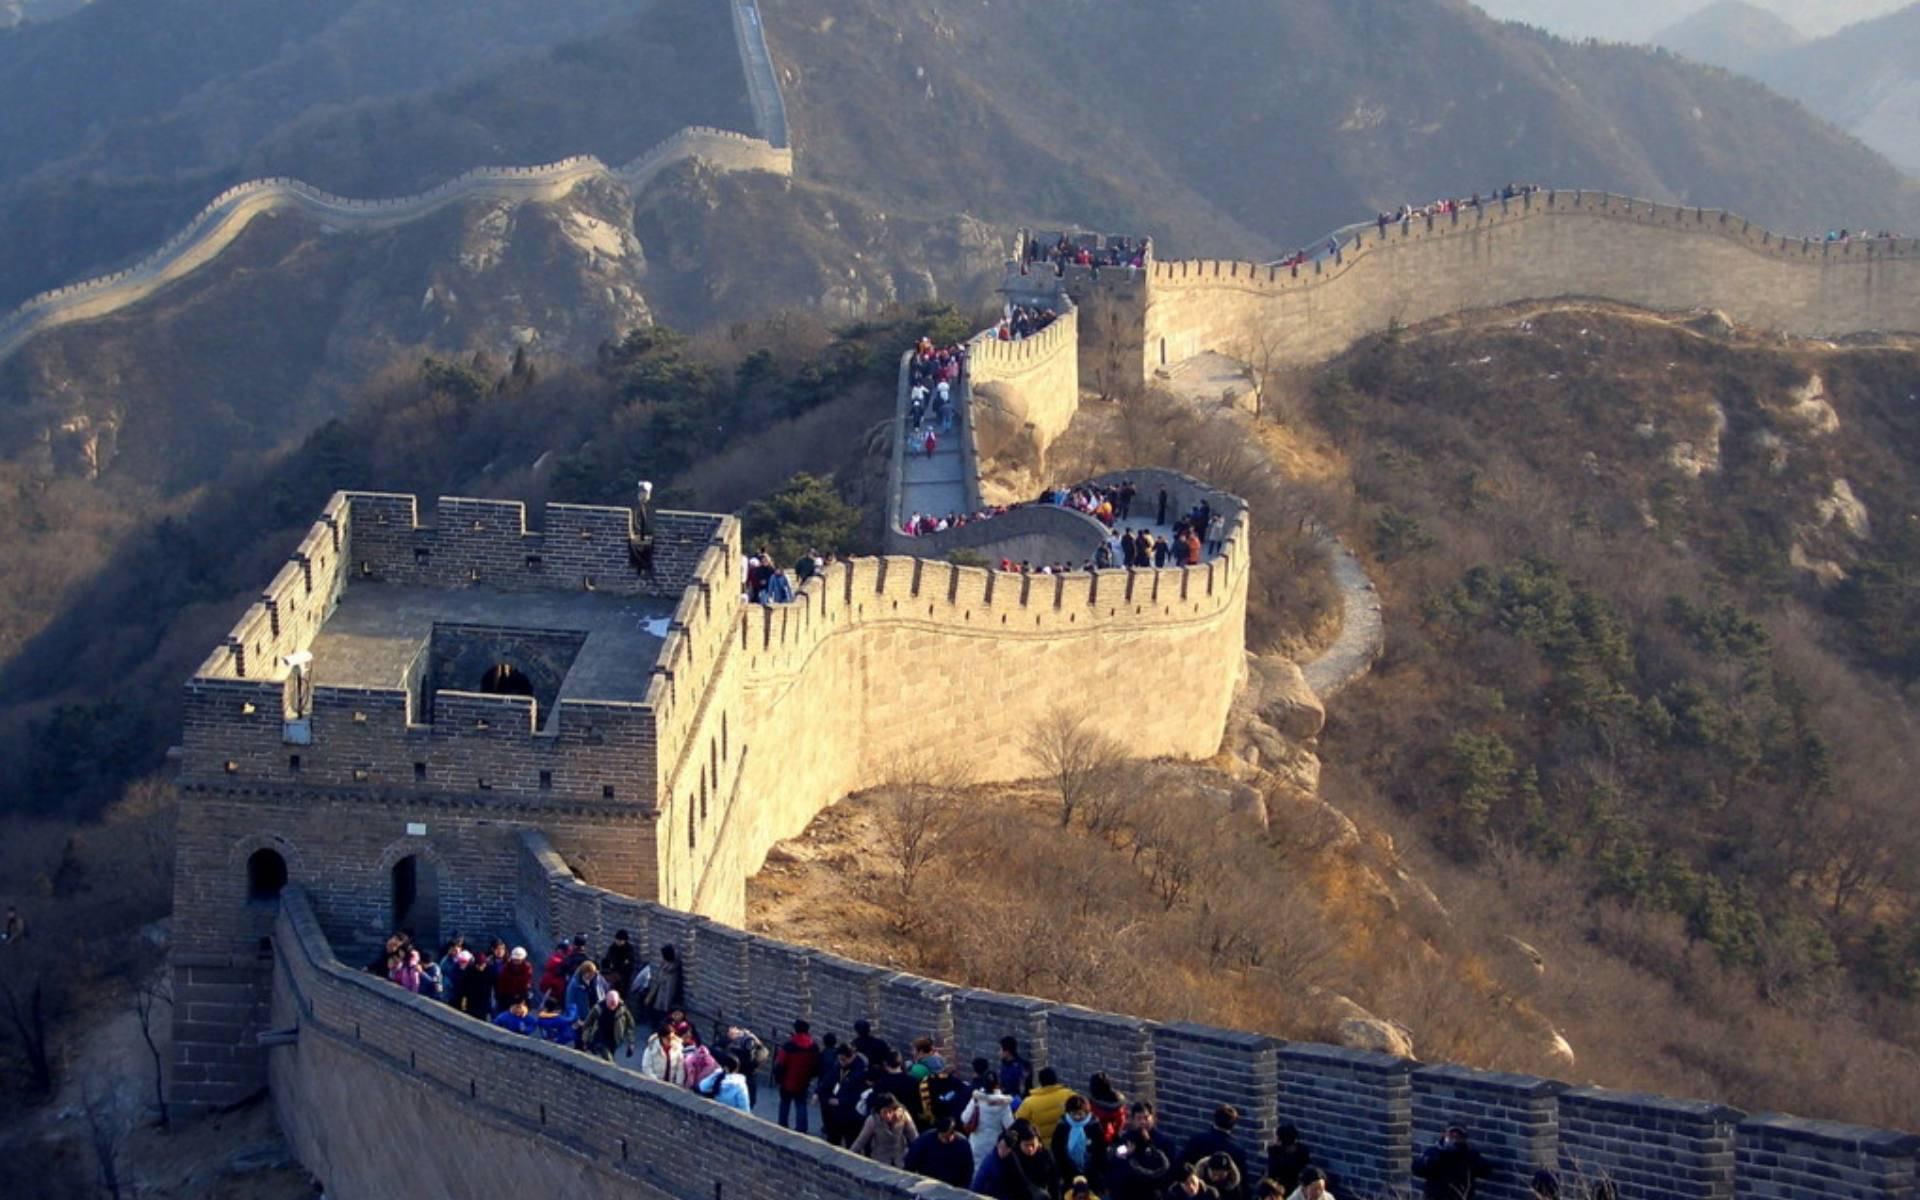 Cars Photos Hd Wallpaper Great Wall Of China Wallpapers